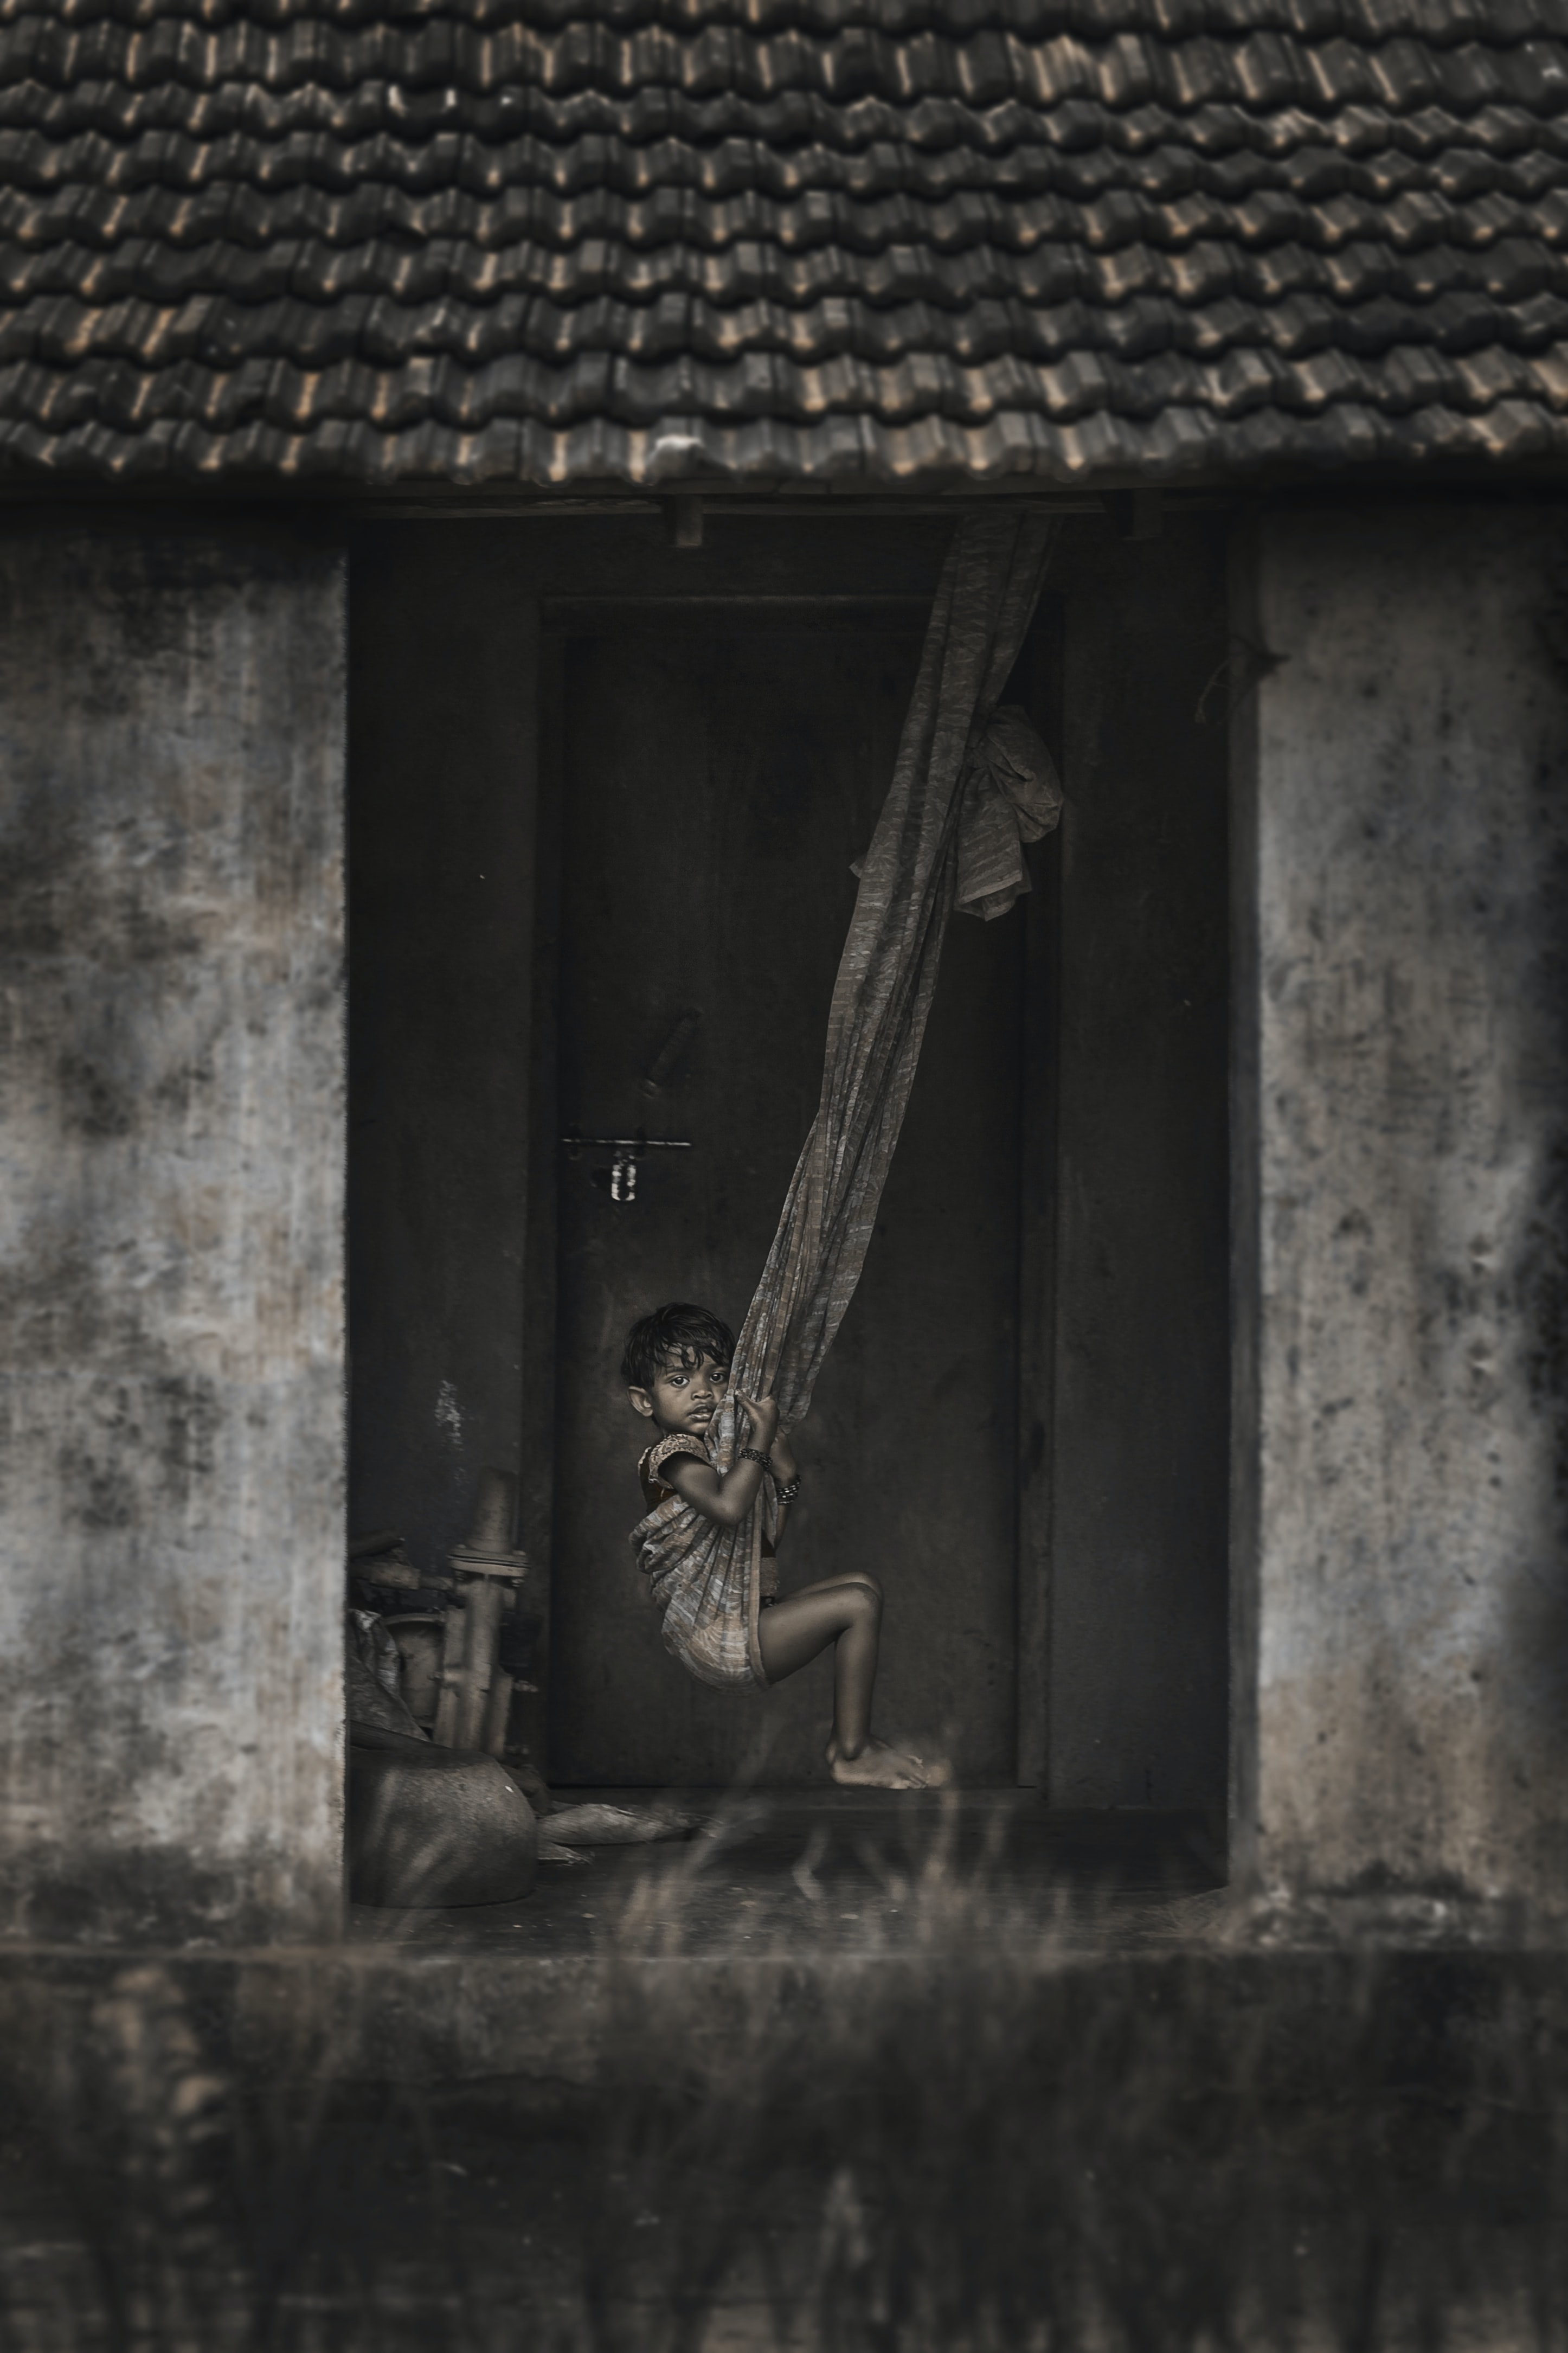 grayscale photo of girl riding hammock